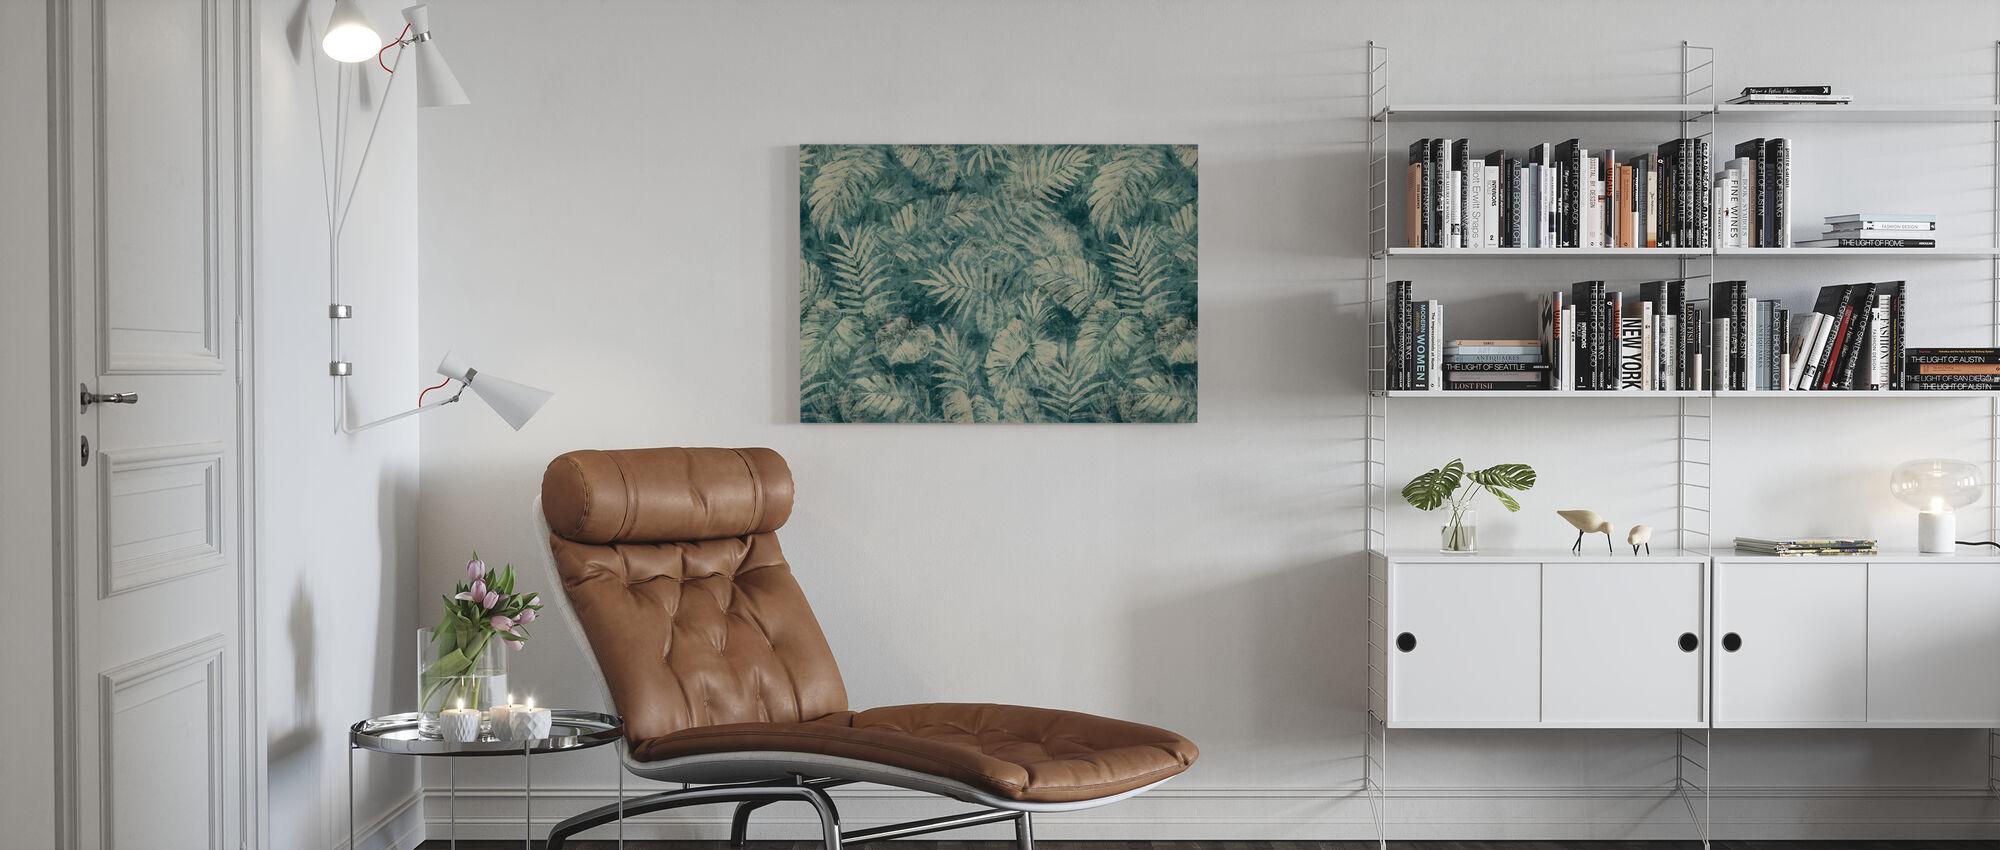 Vegetables - Canvas print - Living Room